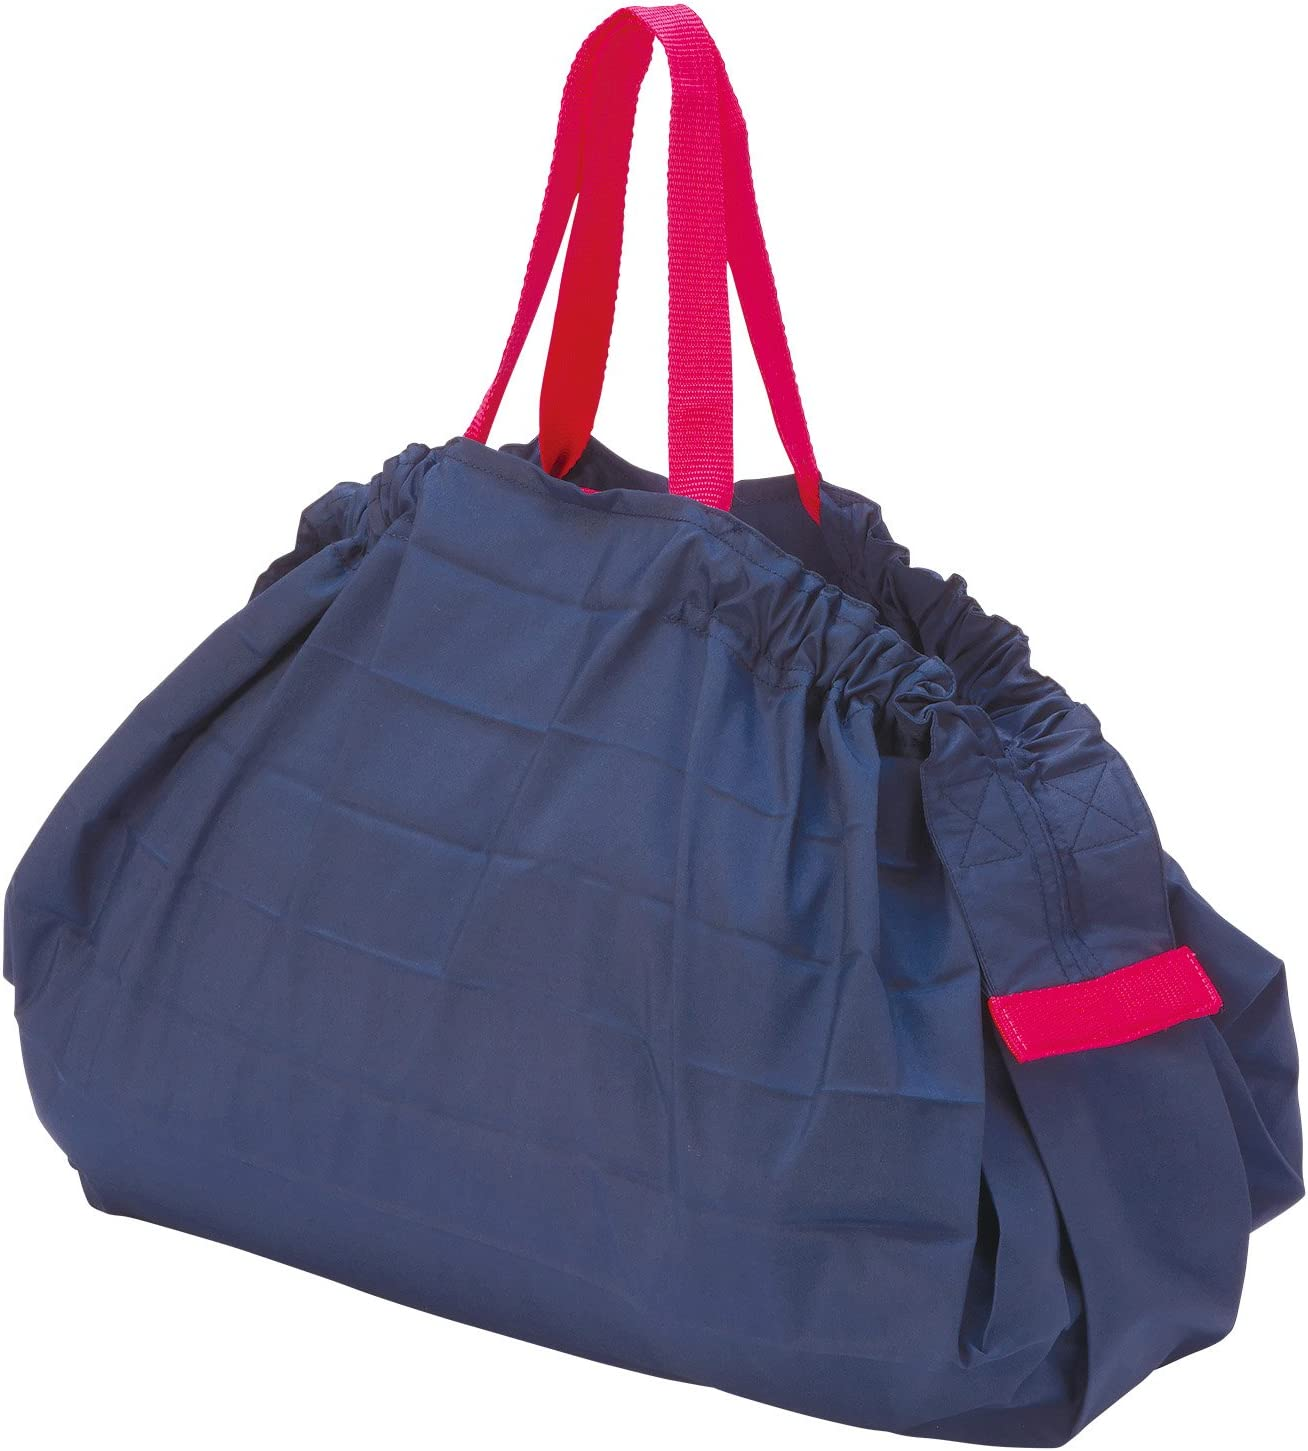 MARNA Reusable Award-winning store Shopping Max 70% OFF Grocery Compact Tote Nav Bag L Foldable